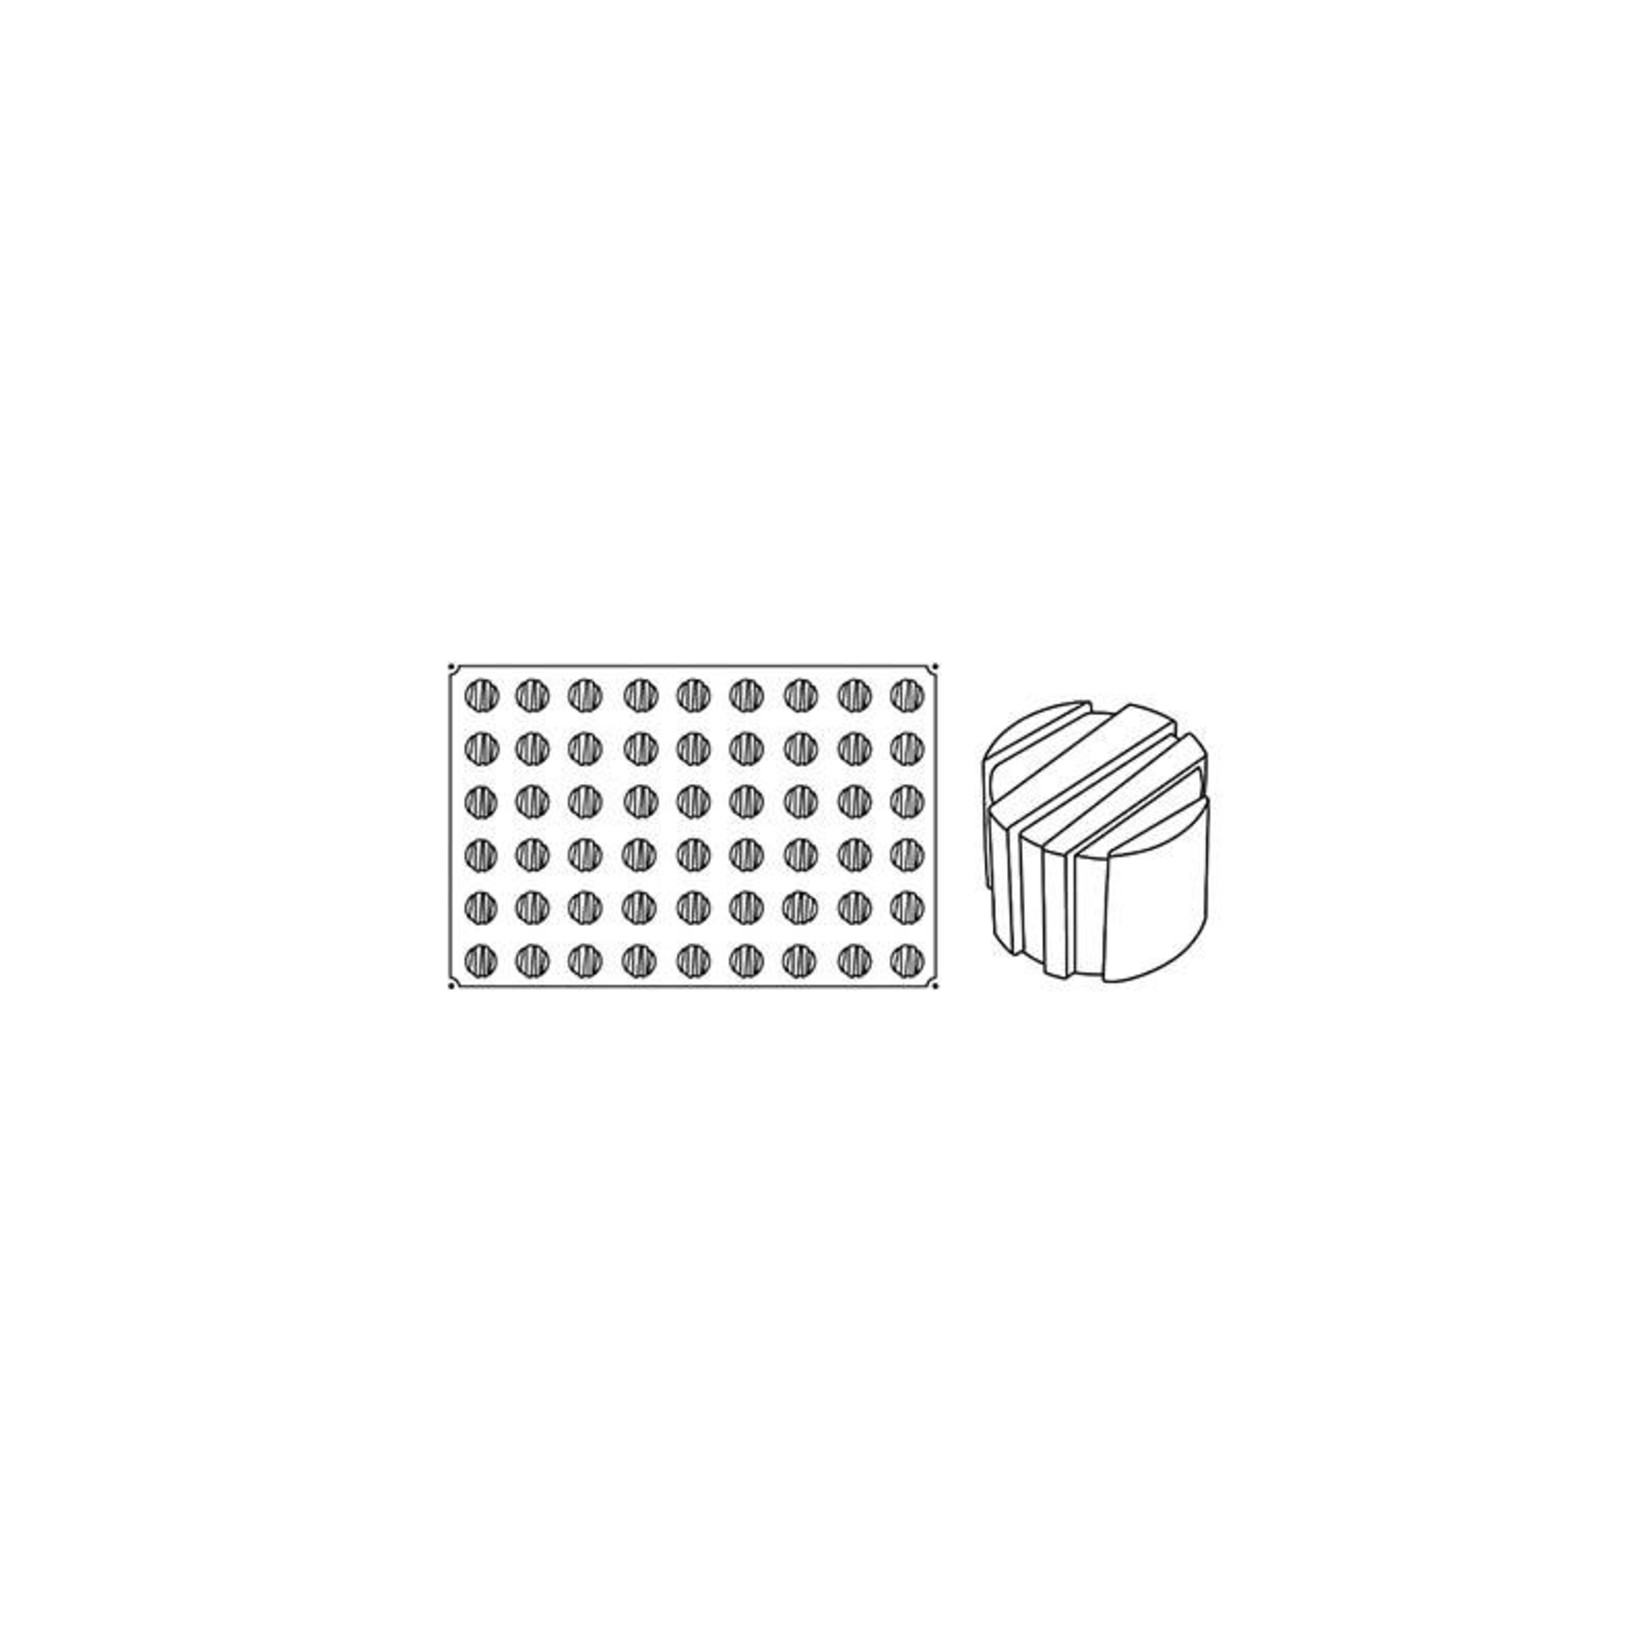 Pavoni Pavoni - Pavoflex silicone mold, Rigo Mignon (54 cavity), PX020